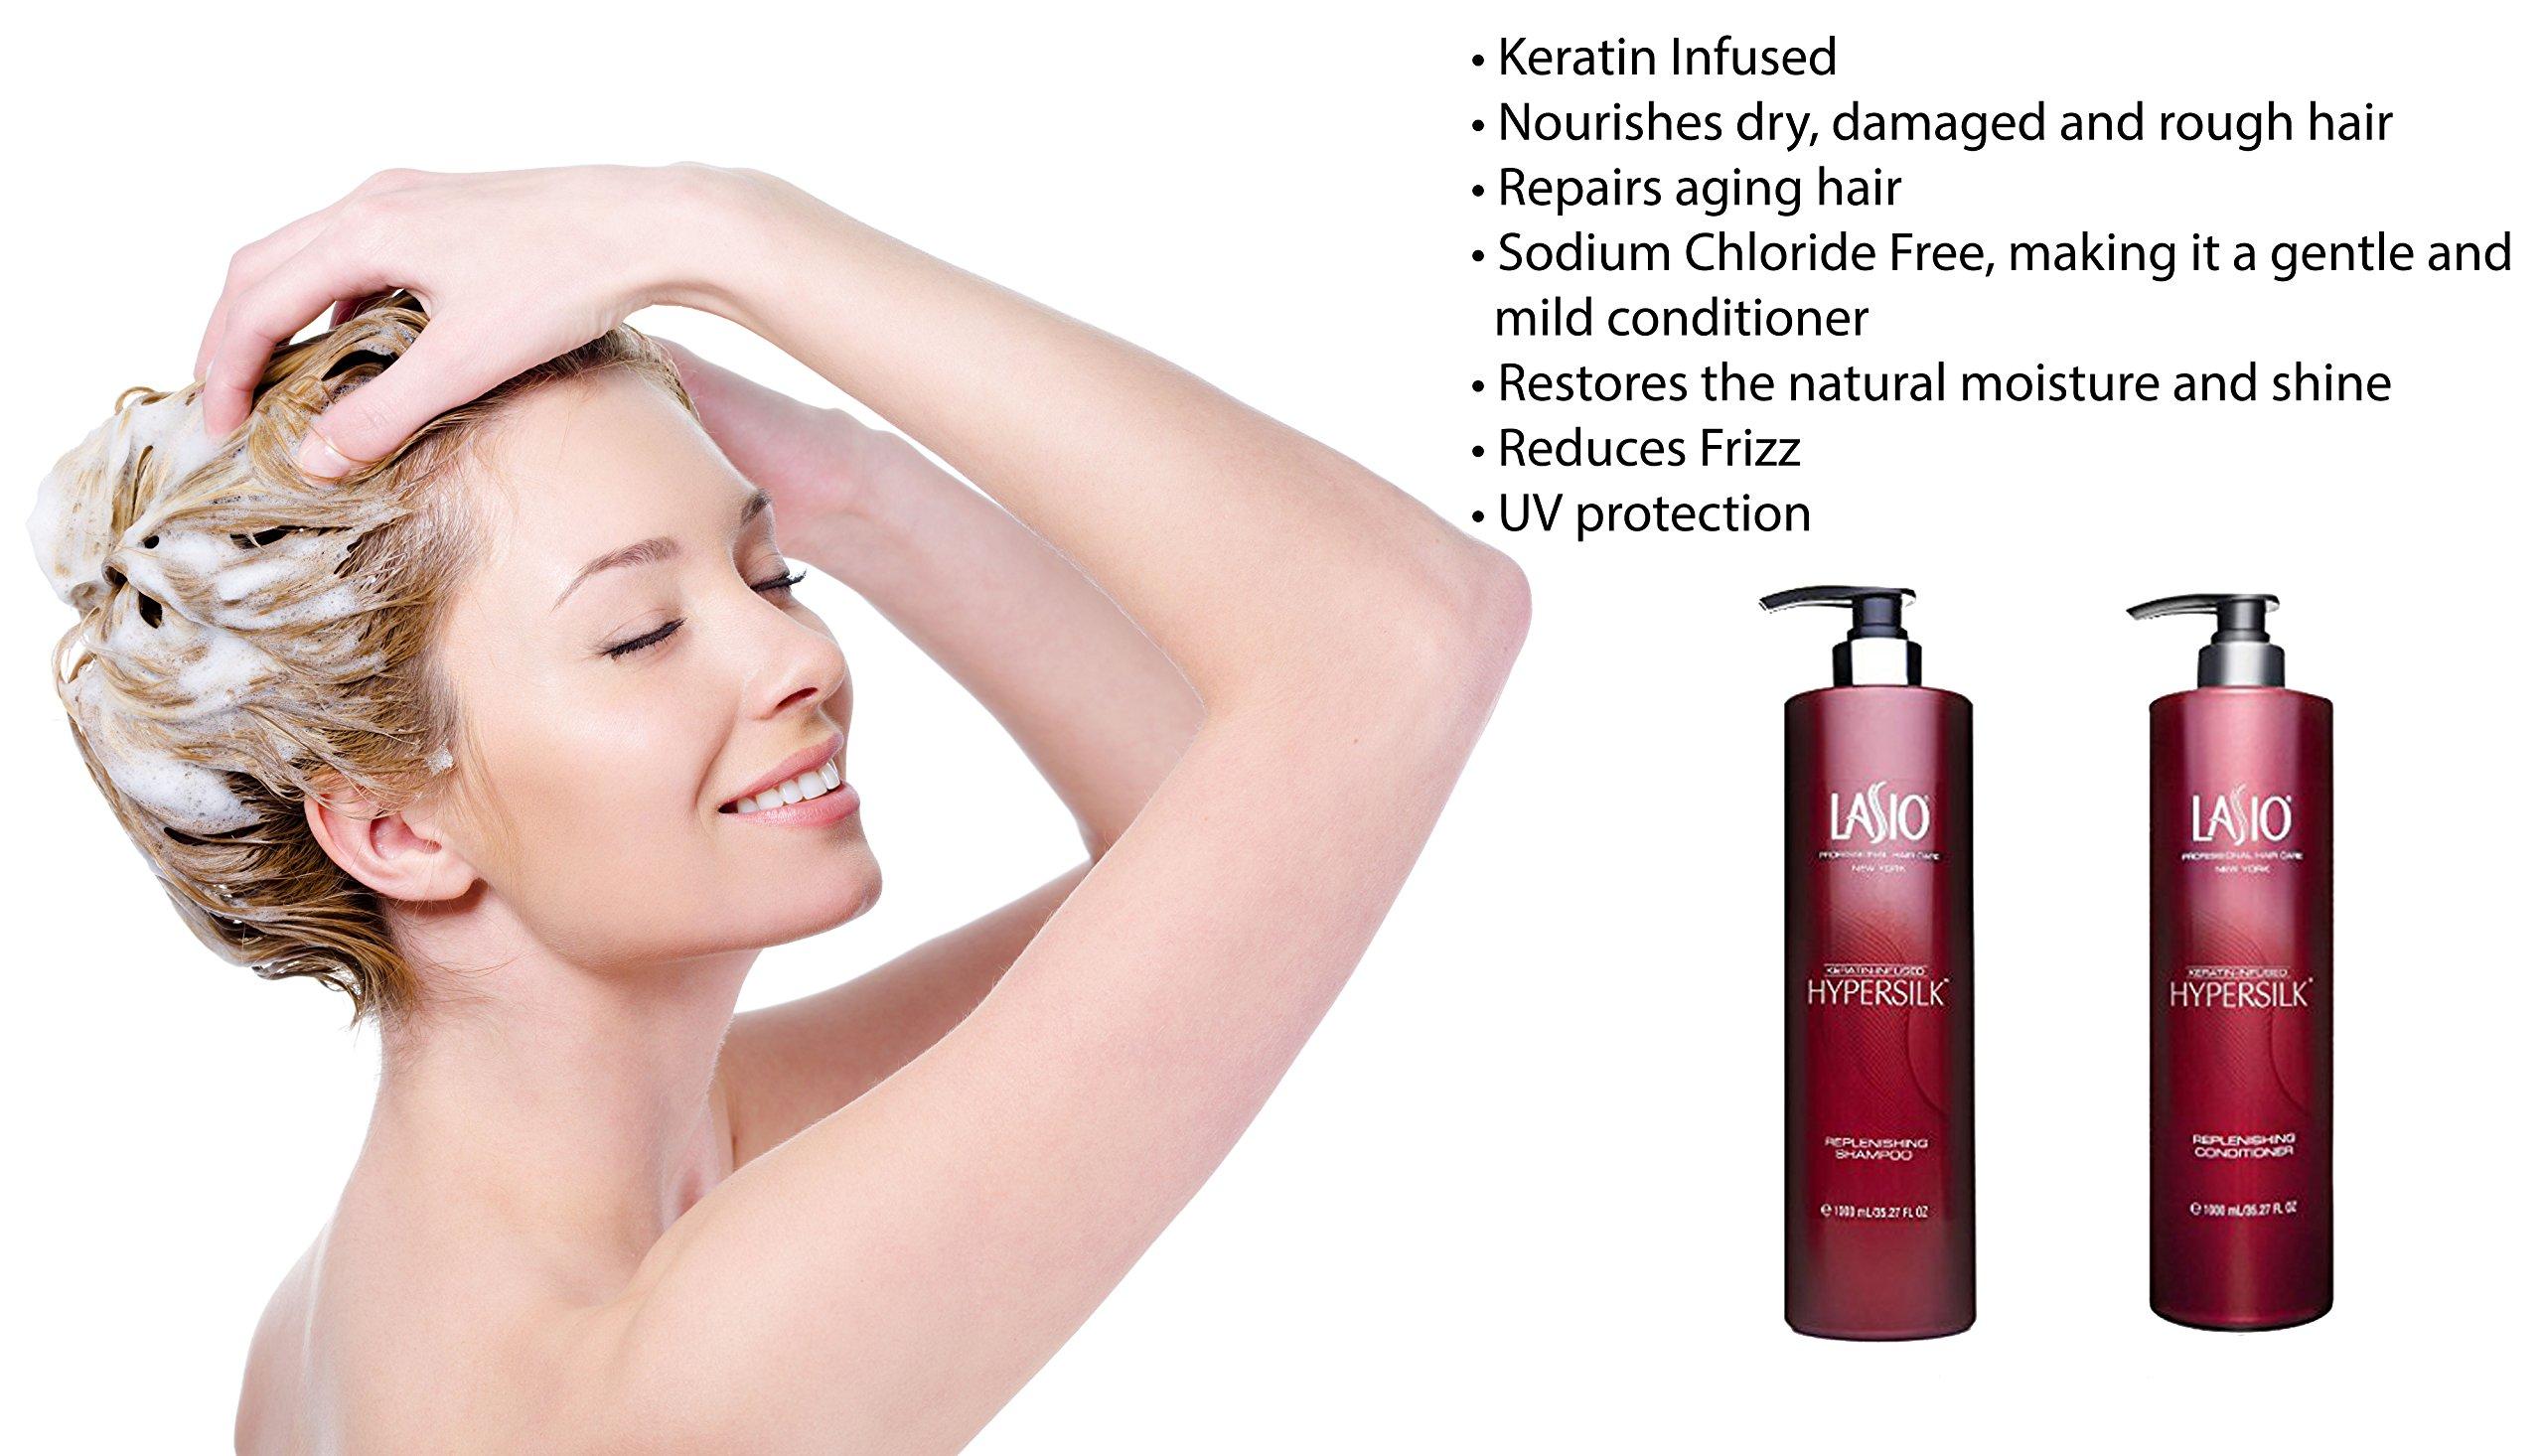 Lasio Keratin Infused Hypersilk Replenishing Shampoo and Conditioner, 35.27 fl. oz.